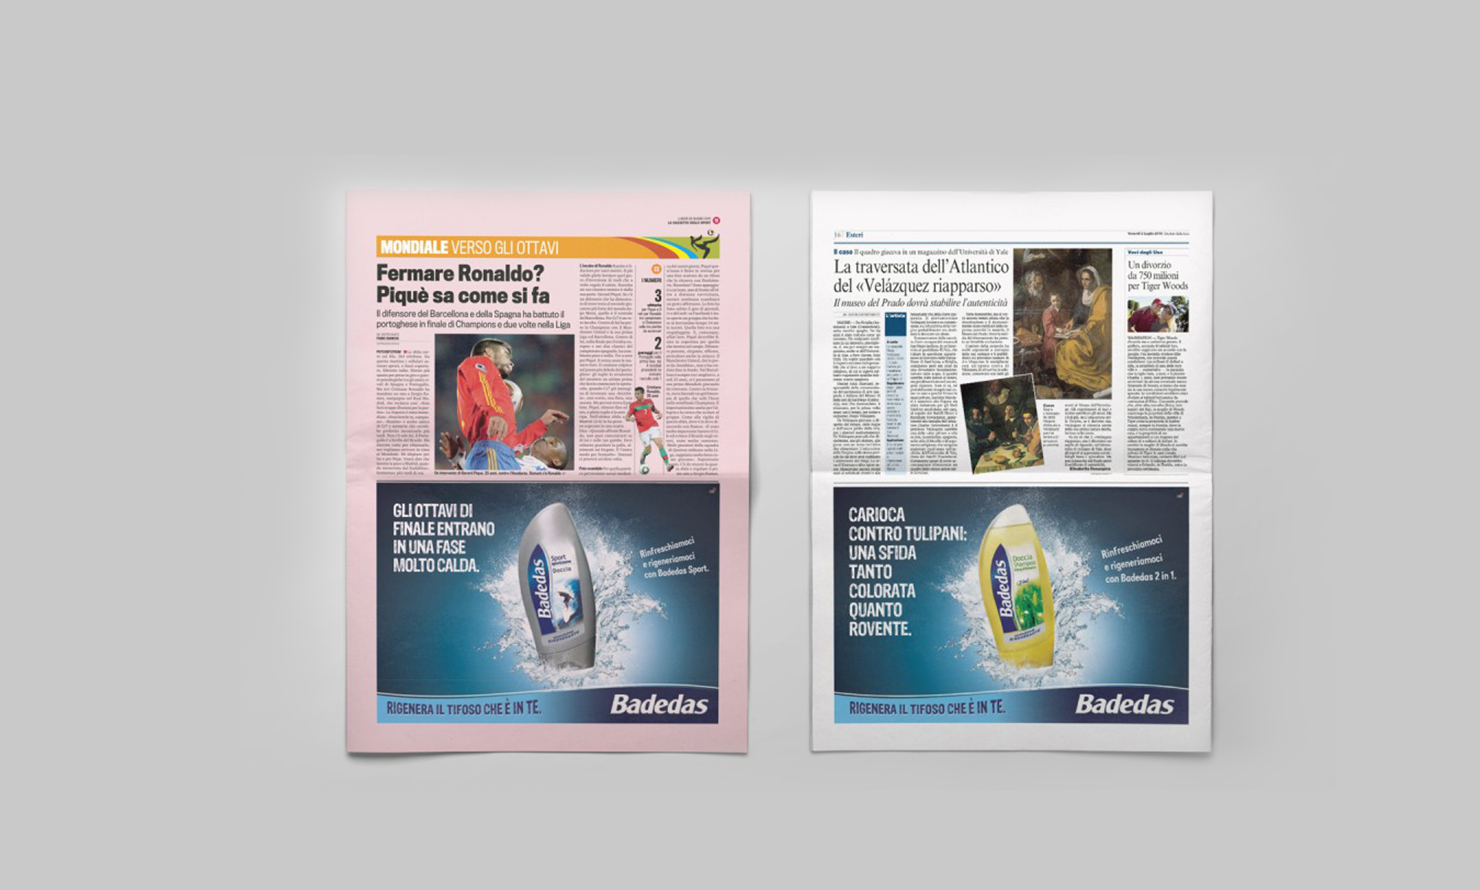 https://kubelibre.com/uploads/Slider-work-tutti-clienti/unilever-badedas-rigenera-il-tifoso-che-cè-in-te-2.jpg